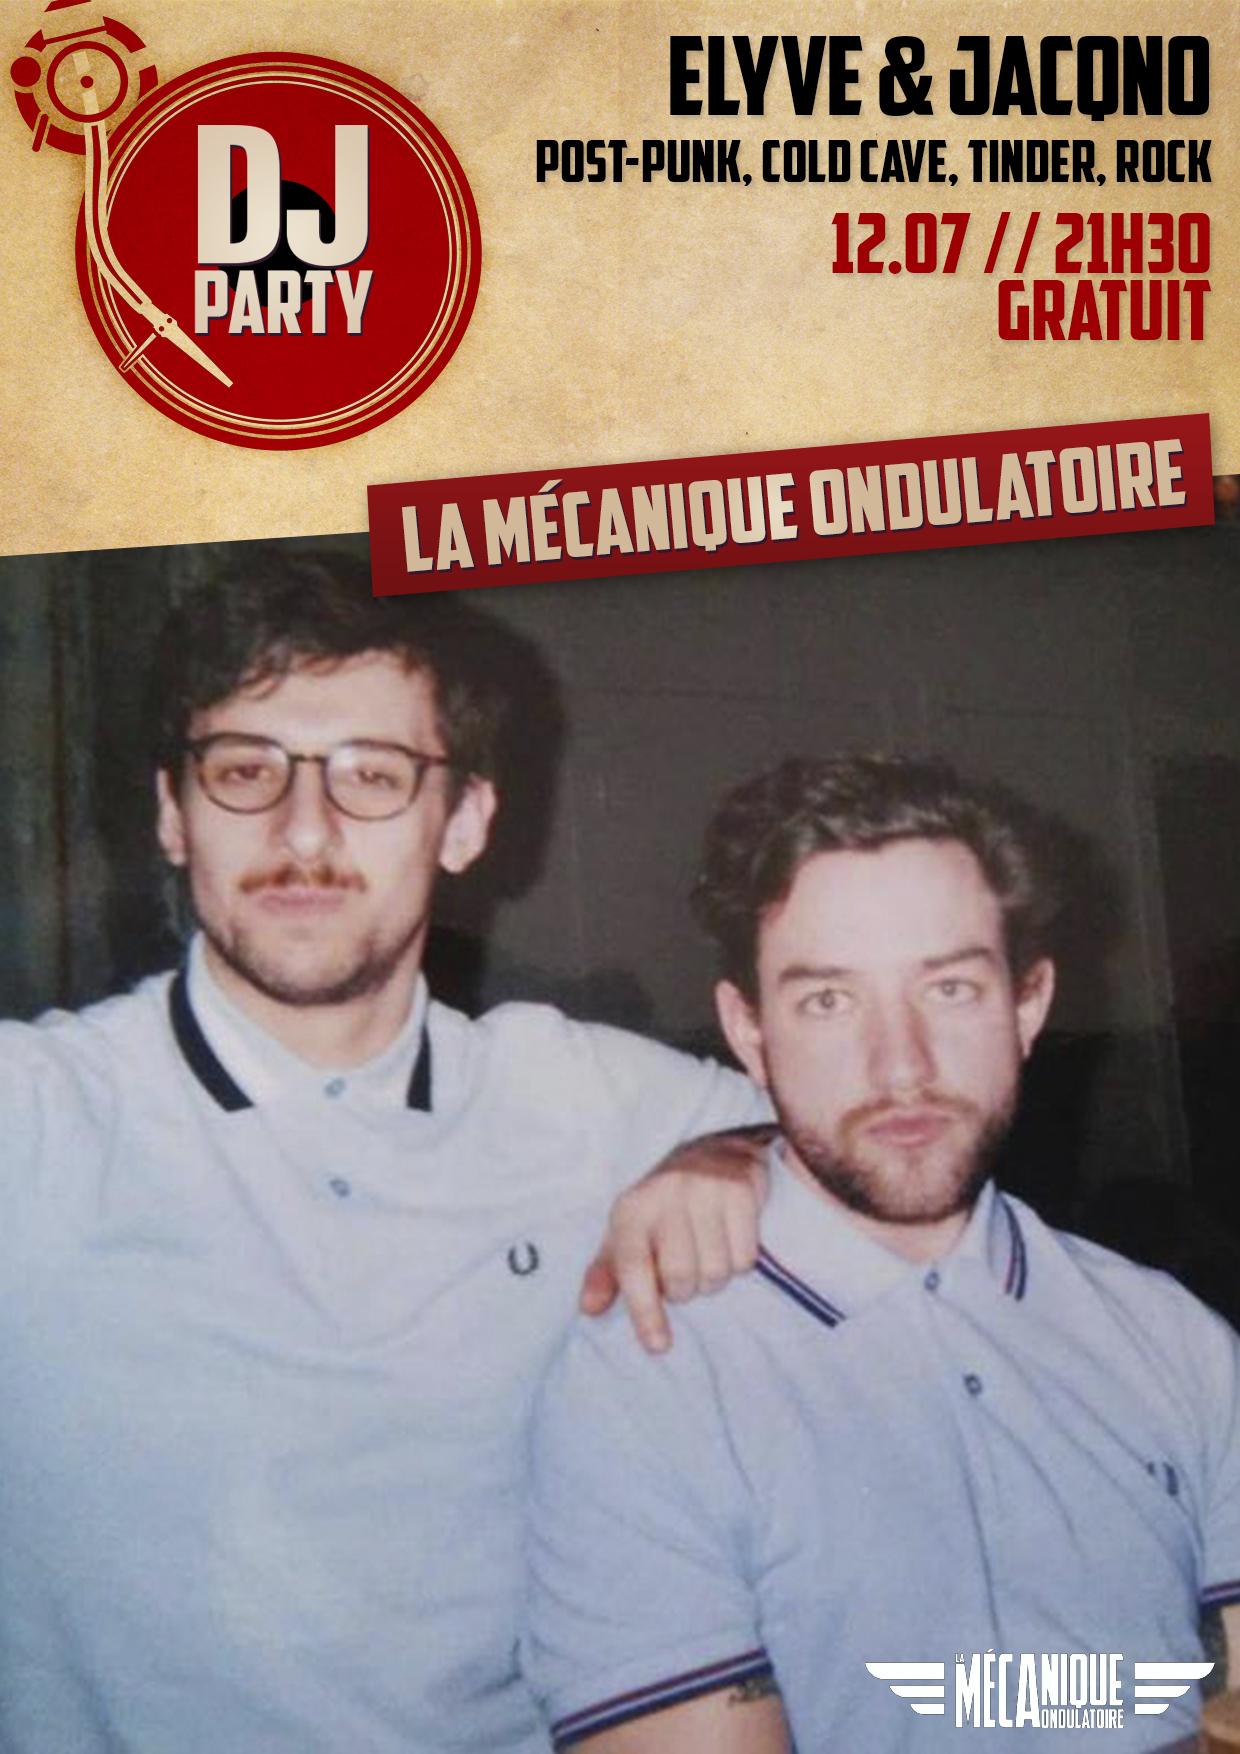 Elyve & Jacqno // 12.07